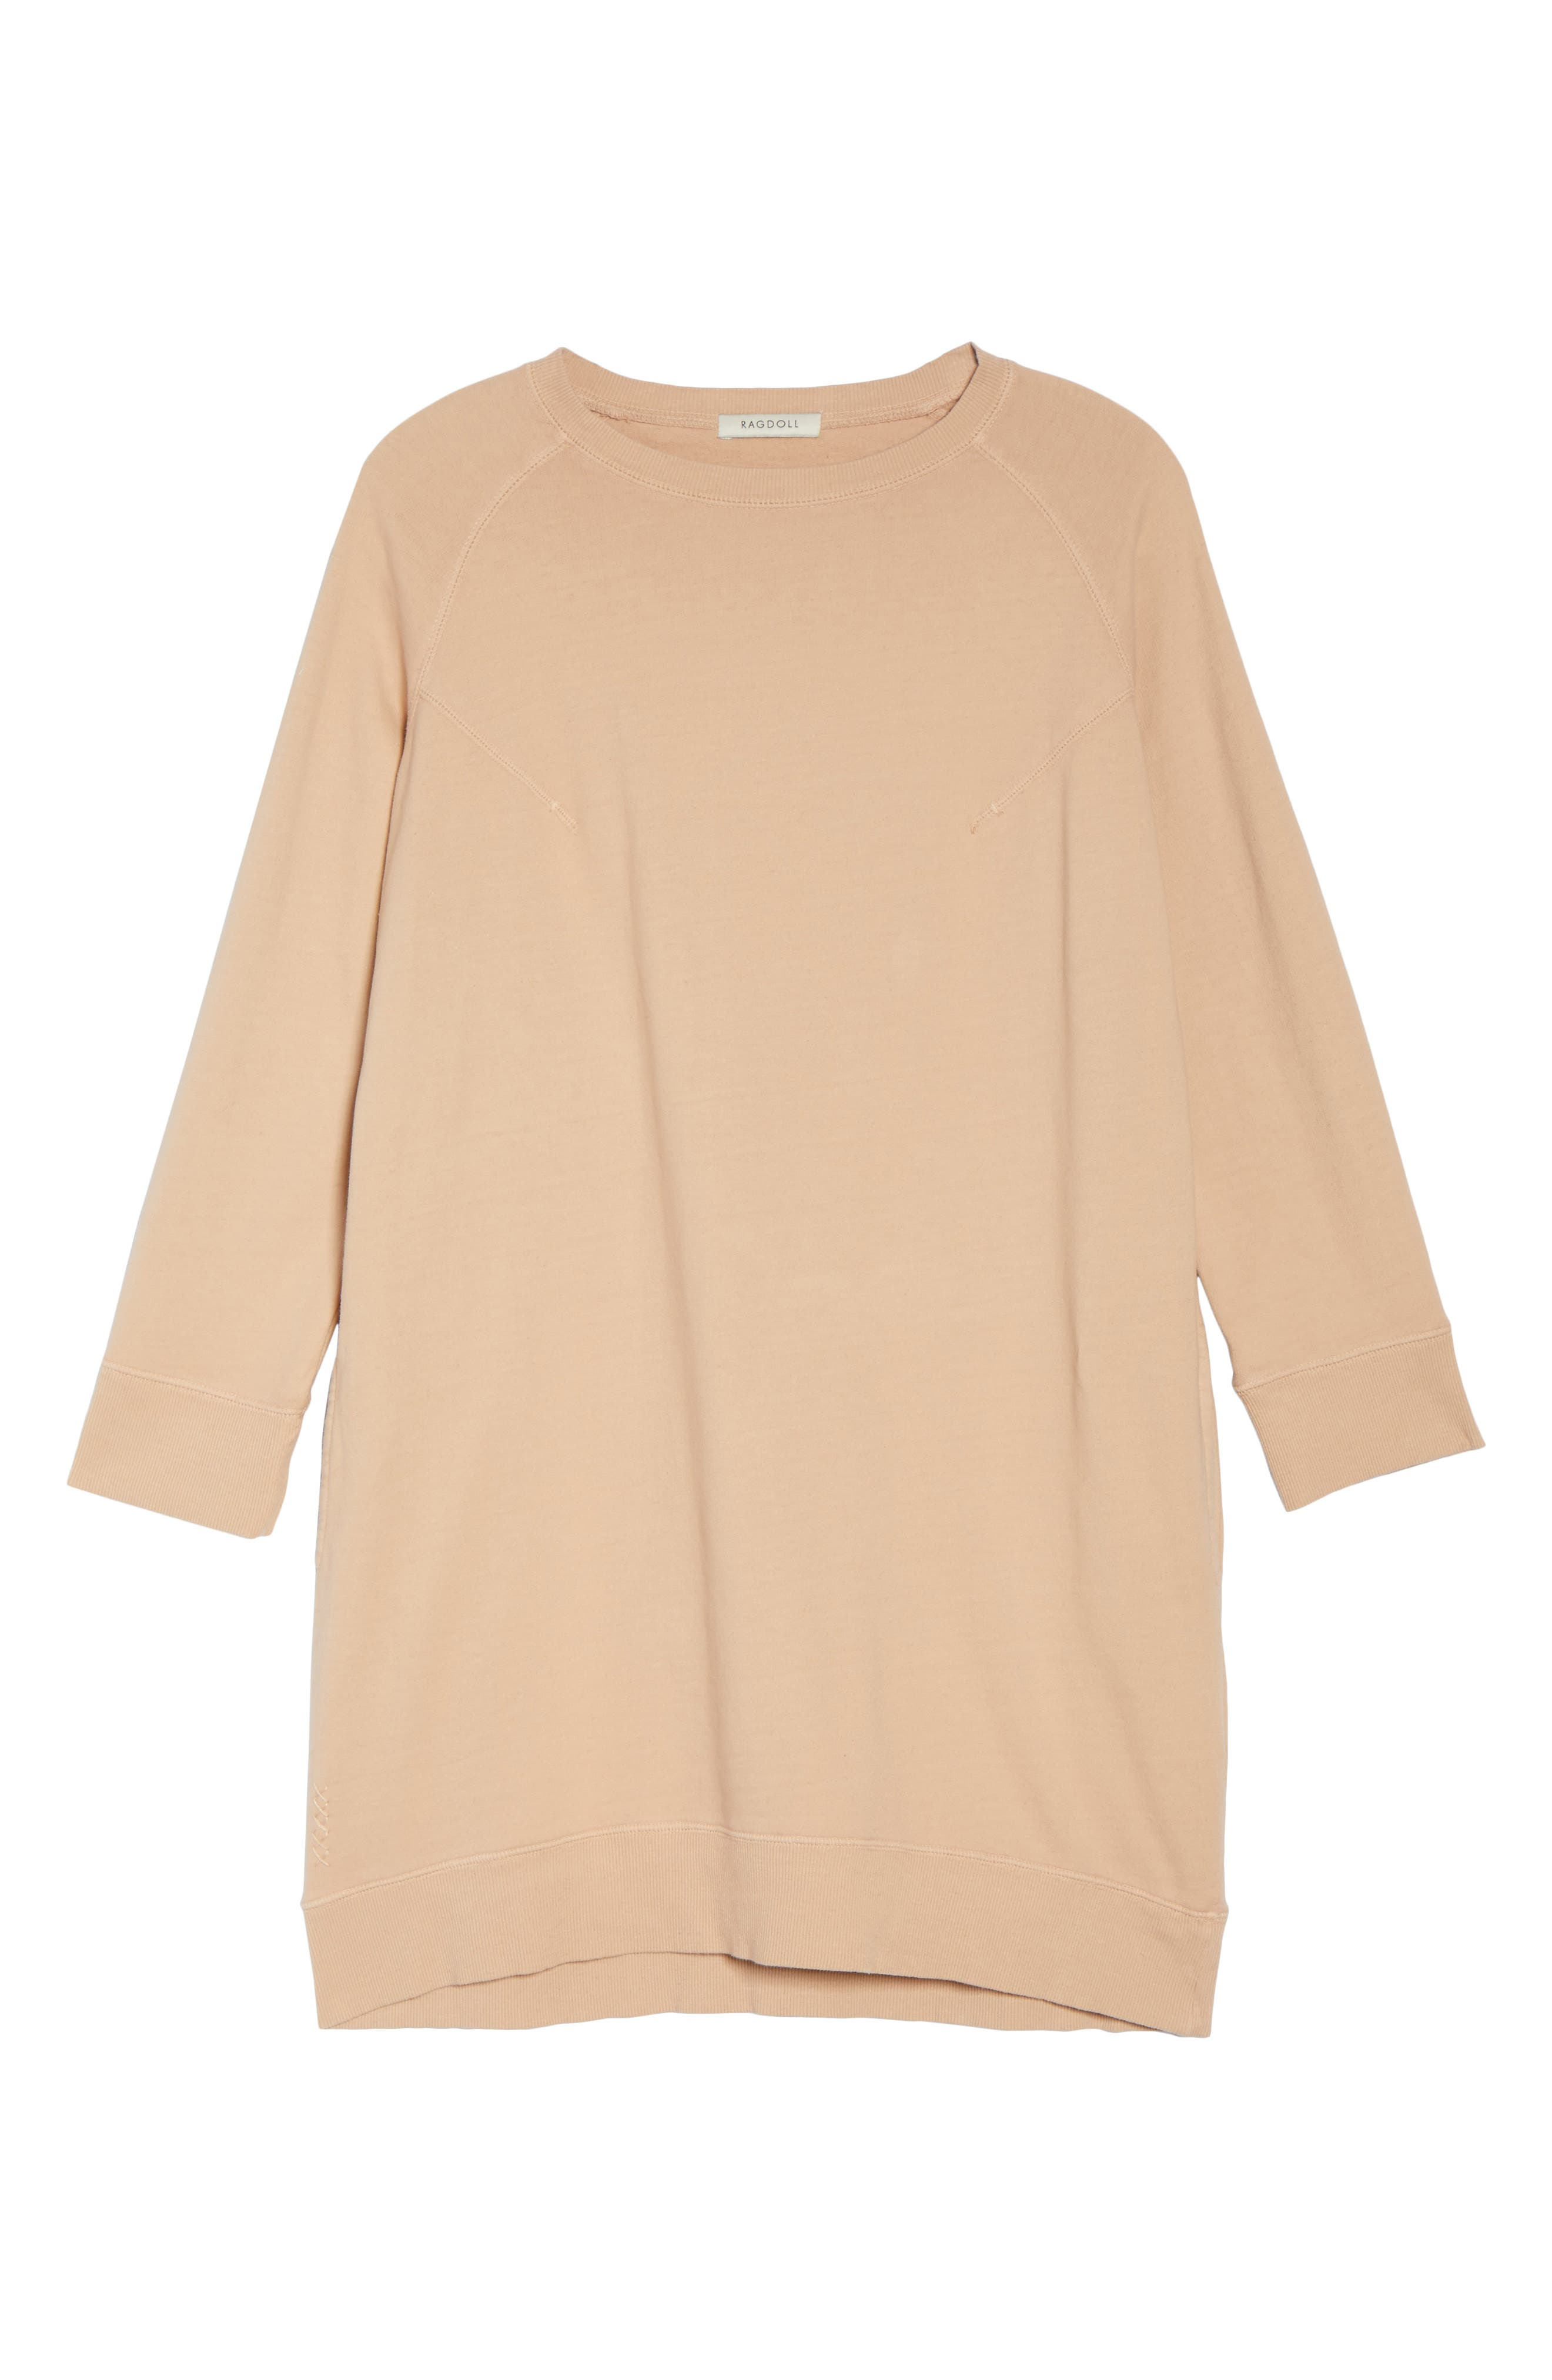 Sweatshirt Dress,                             Alternate thumbnail 6, color,                             Nude